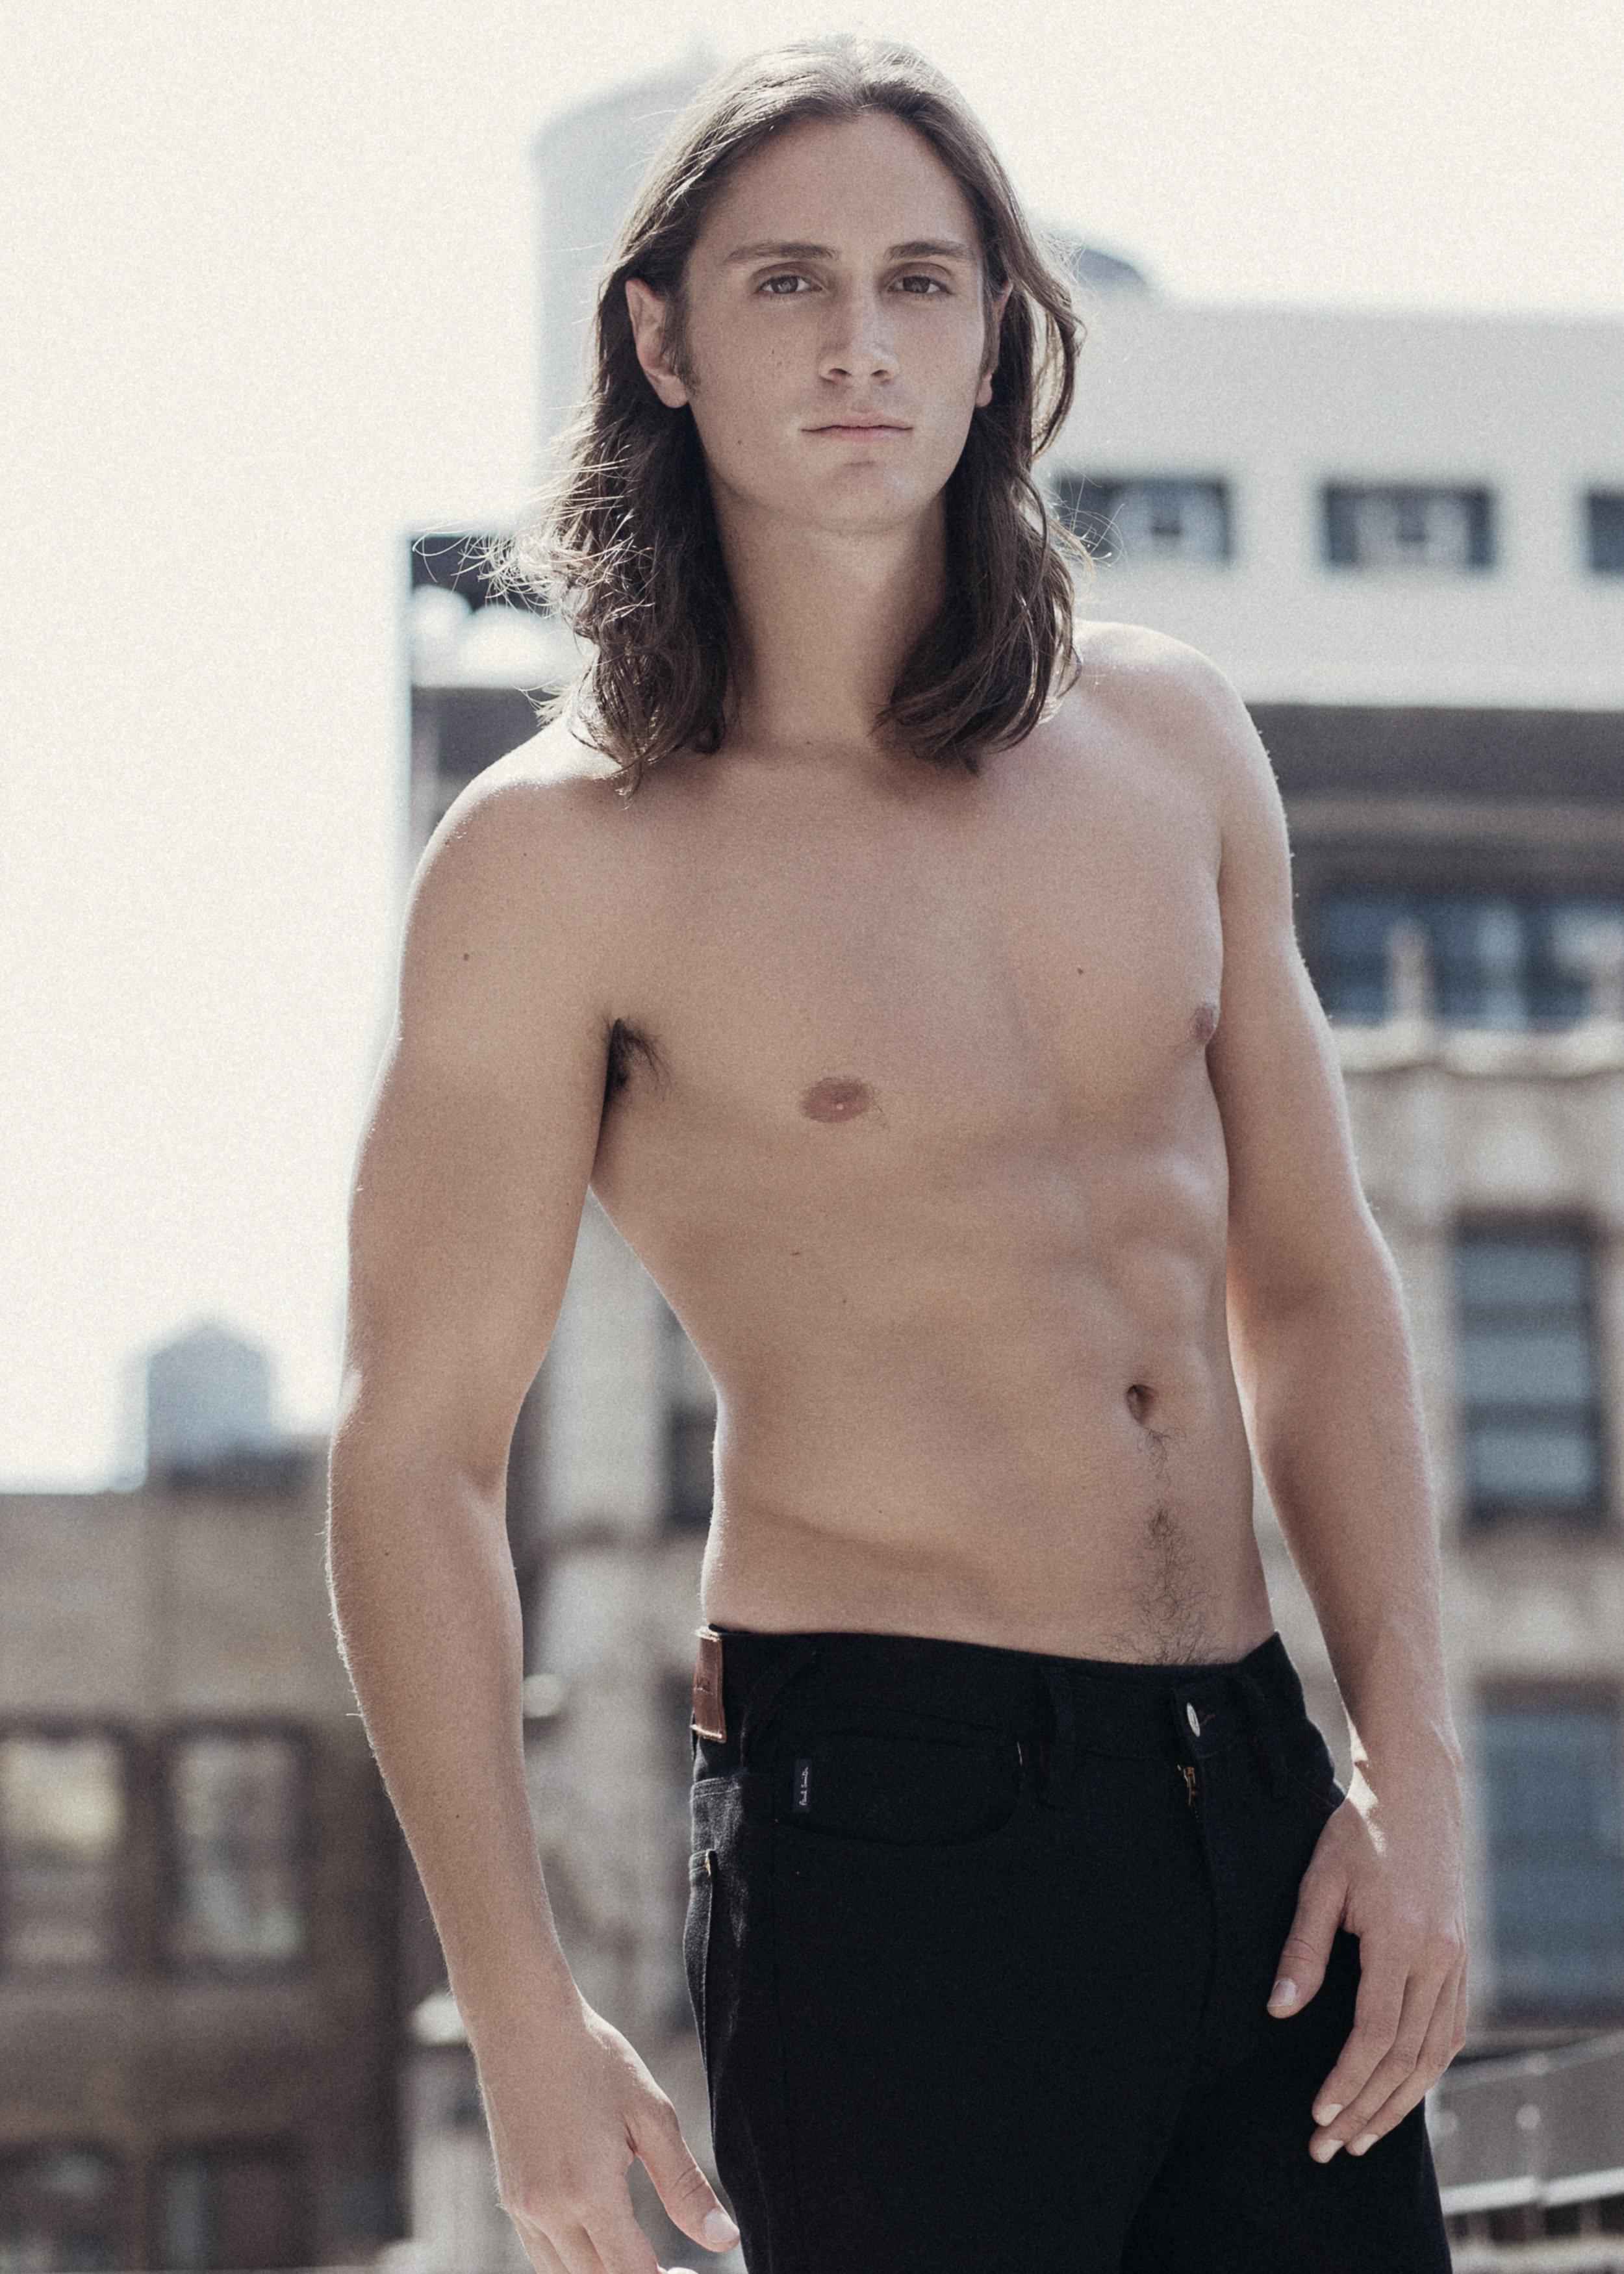 nyc-photographers-male-model-test-10020.jpg